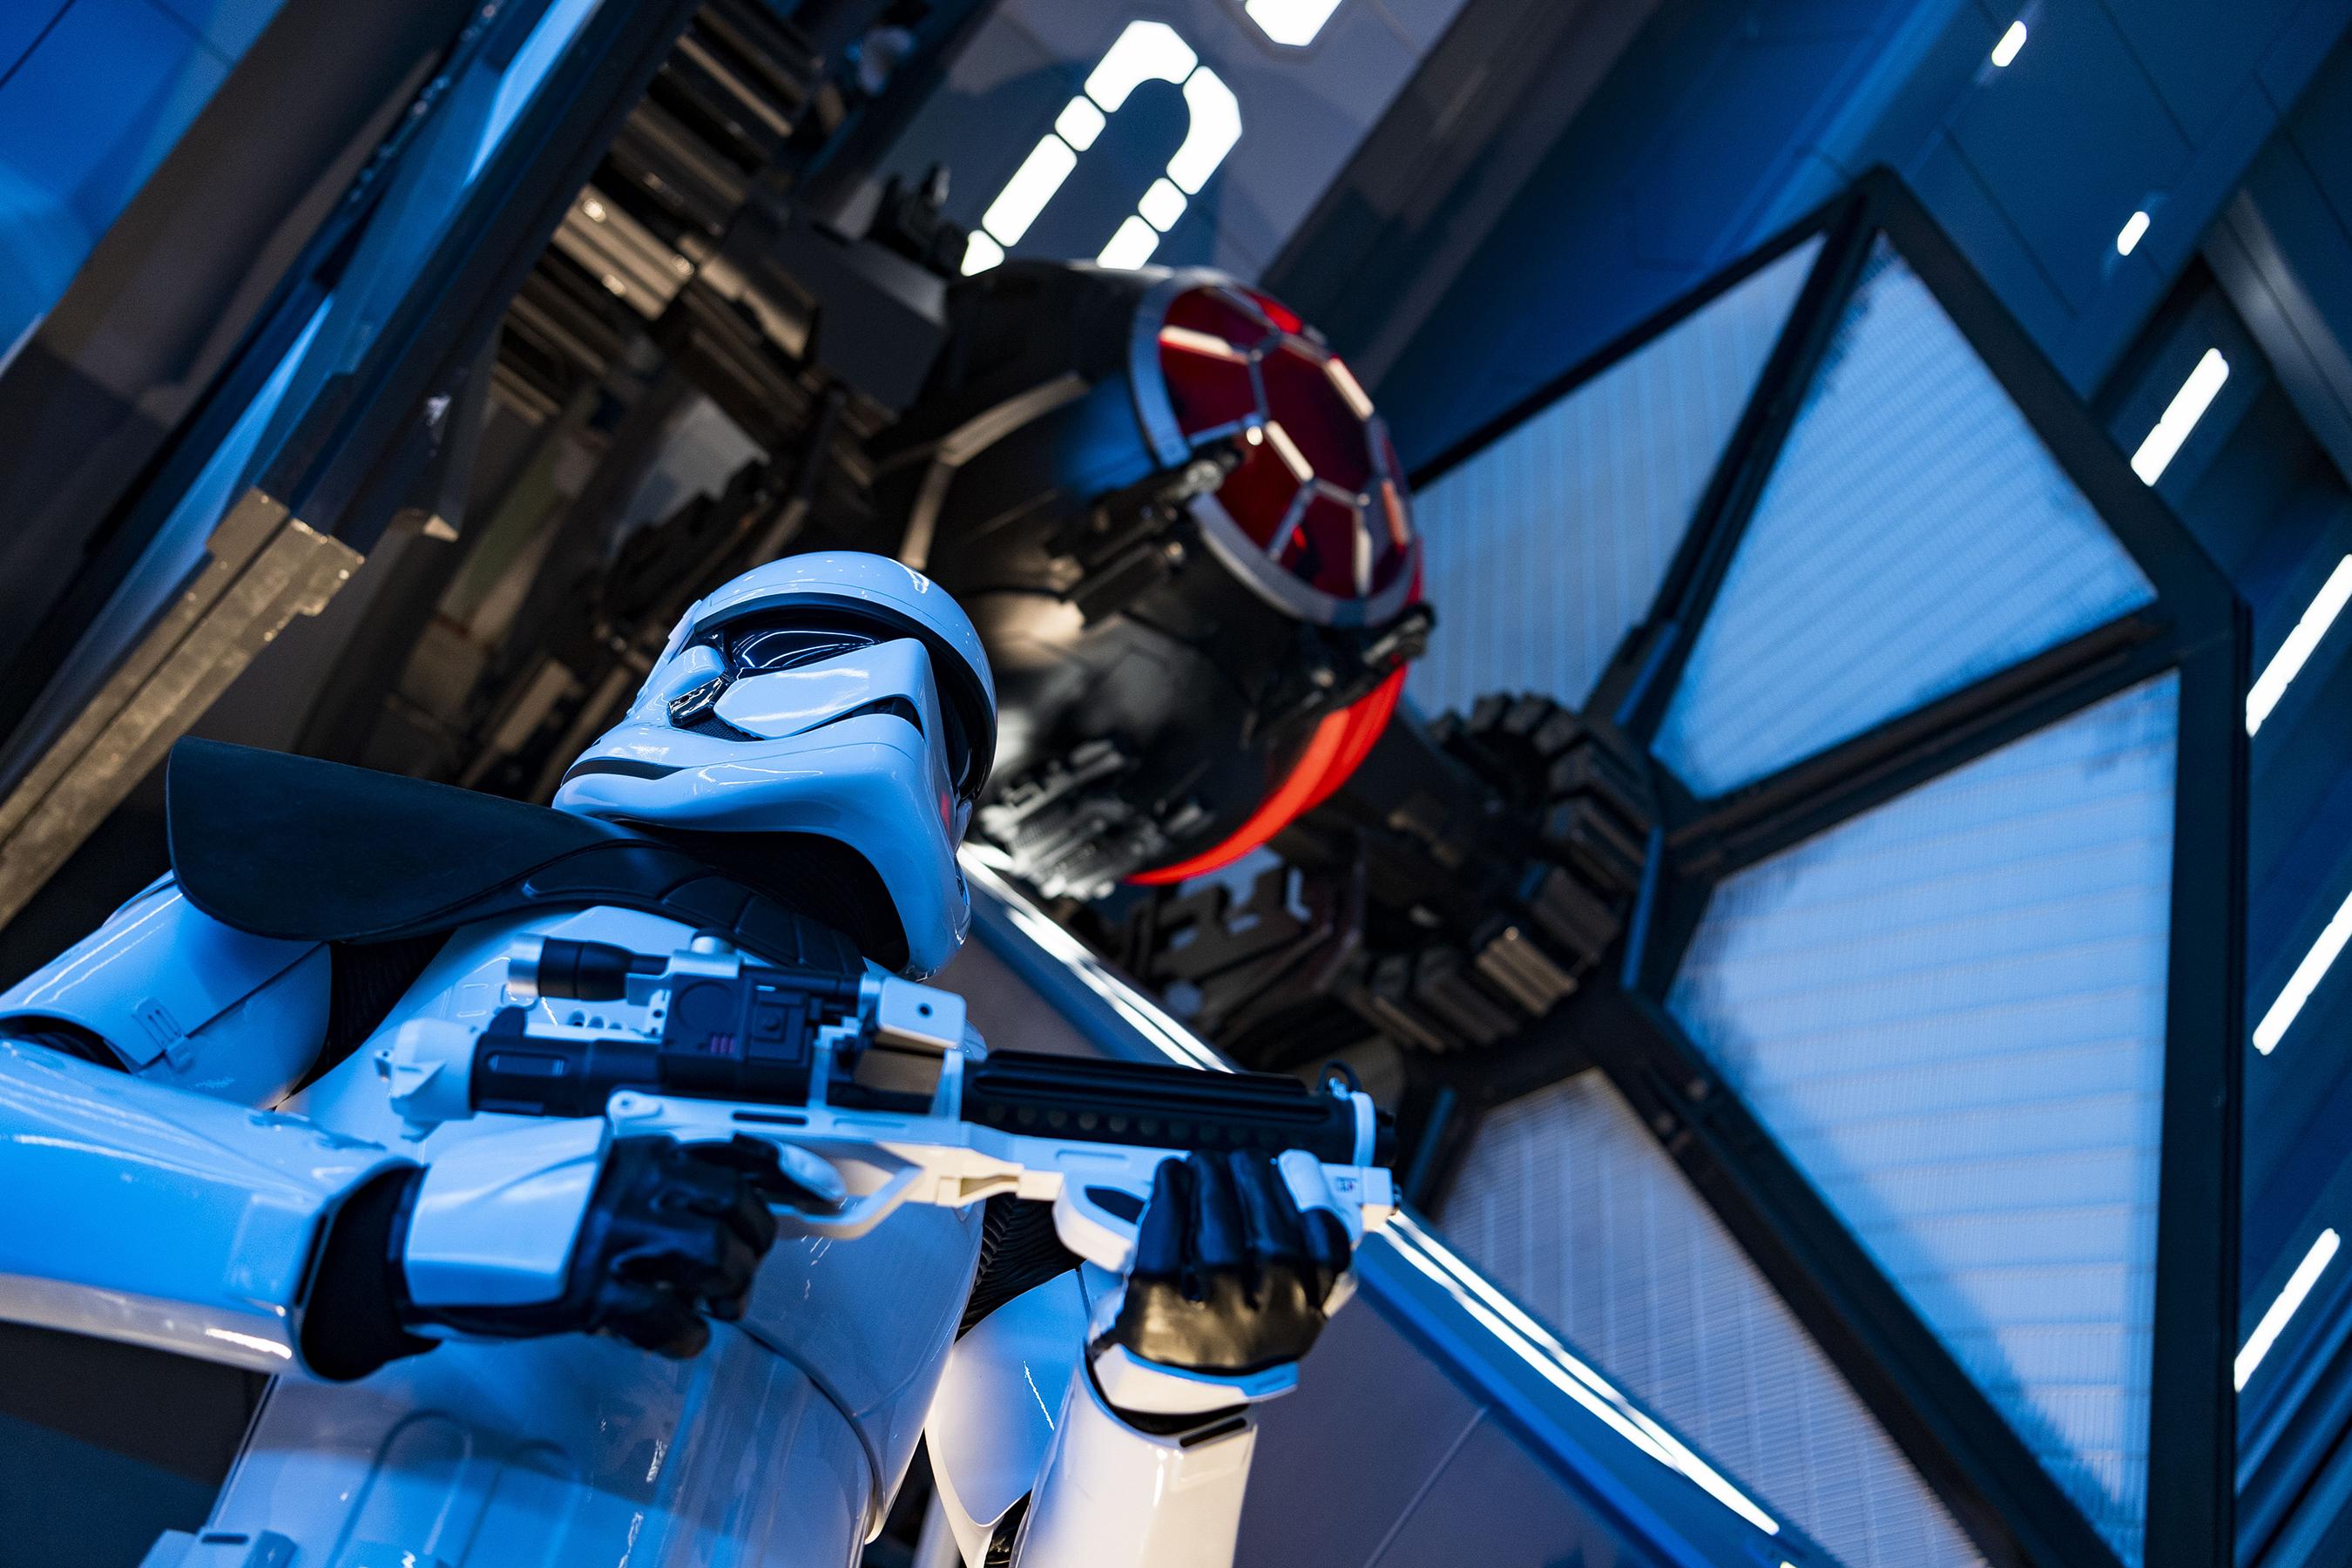 Disney's Star Wars dark ride Rise of the Resistance delivers sensory overload